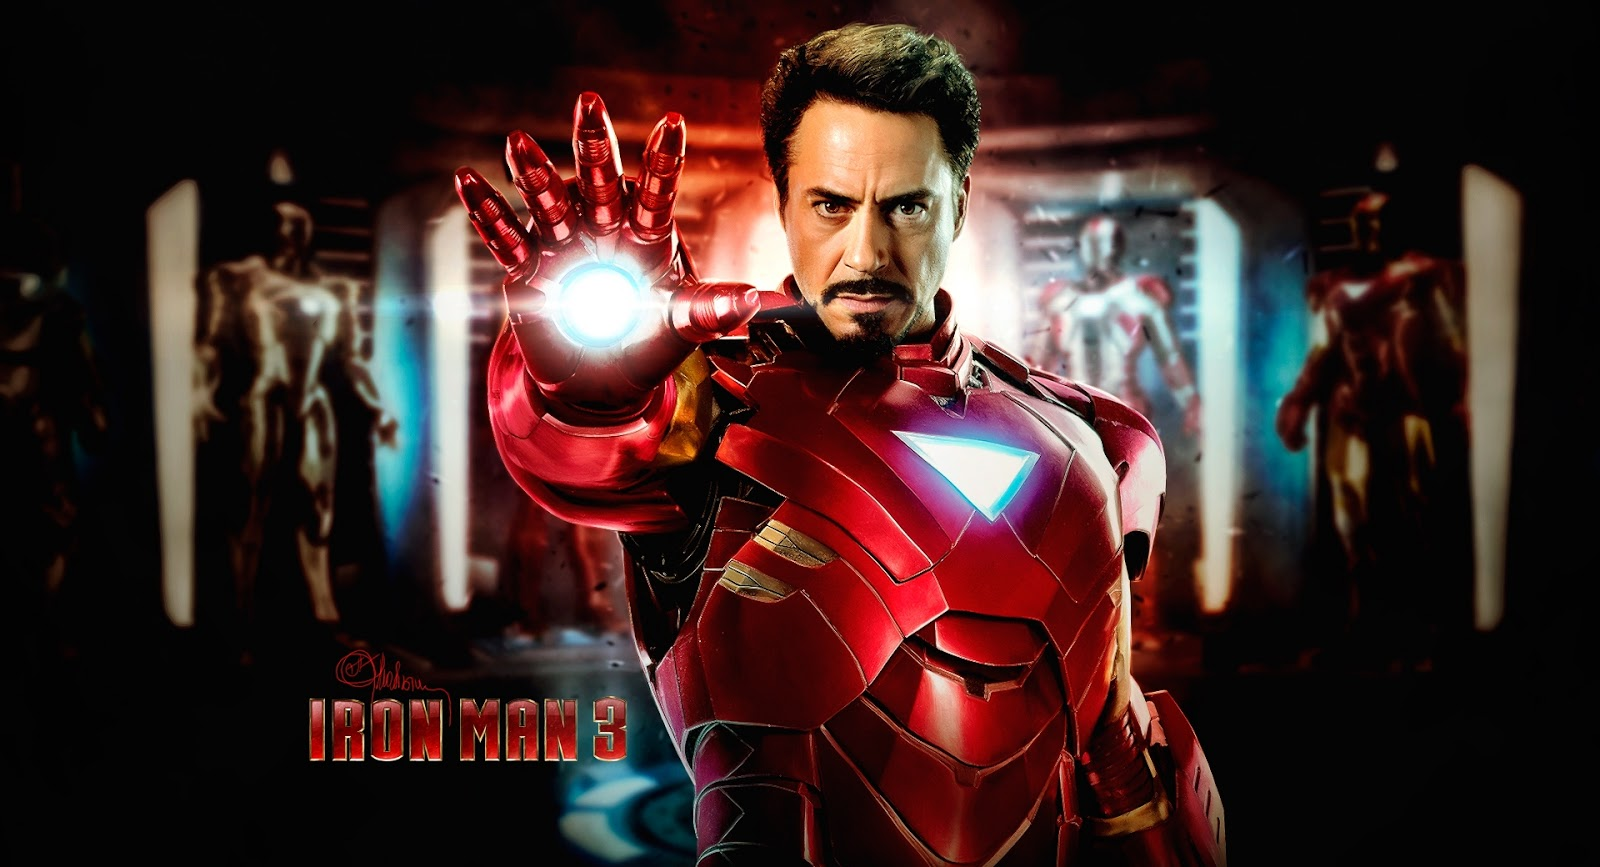 Pic Famina: Iron Man 3 Movie Hd Wallpapers